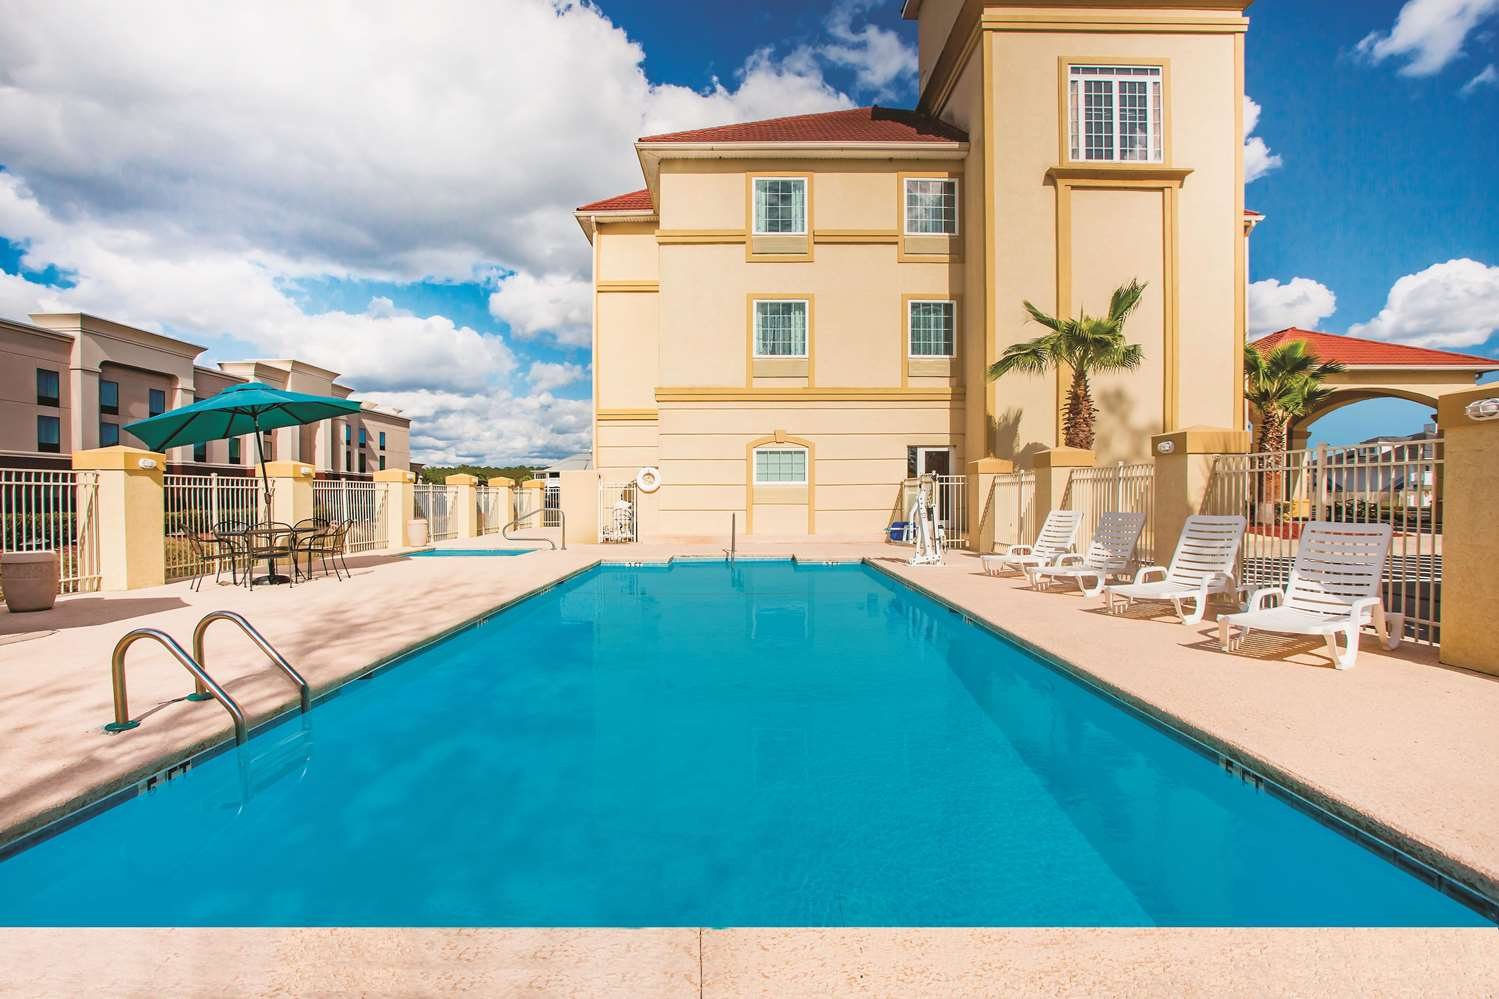 Pool - La Quinta Inn Kingsland